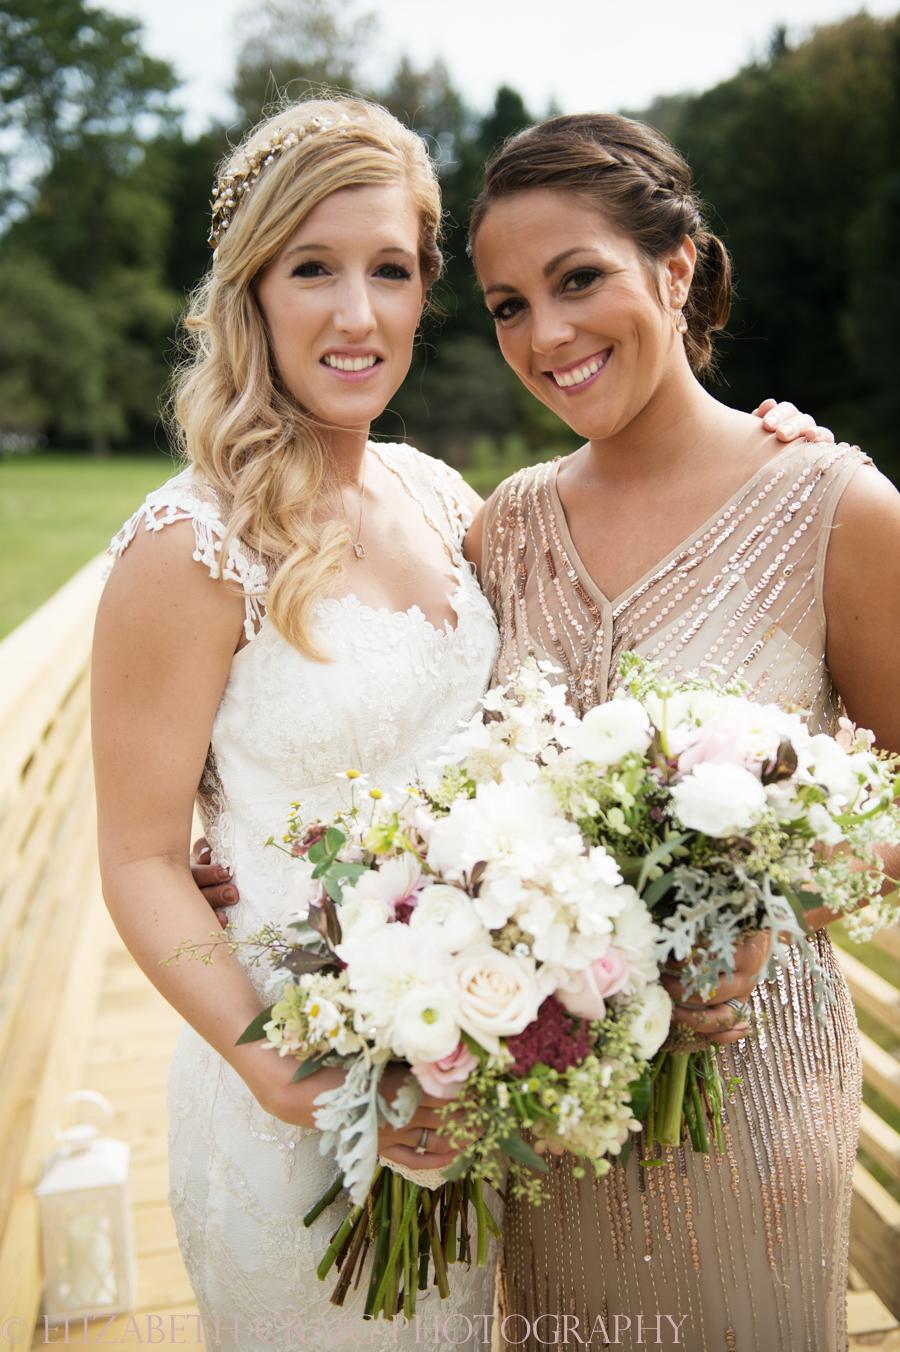 Dubois Brockway St. Marys PA Weddings-0124